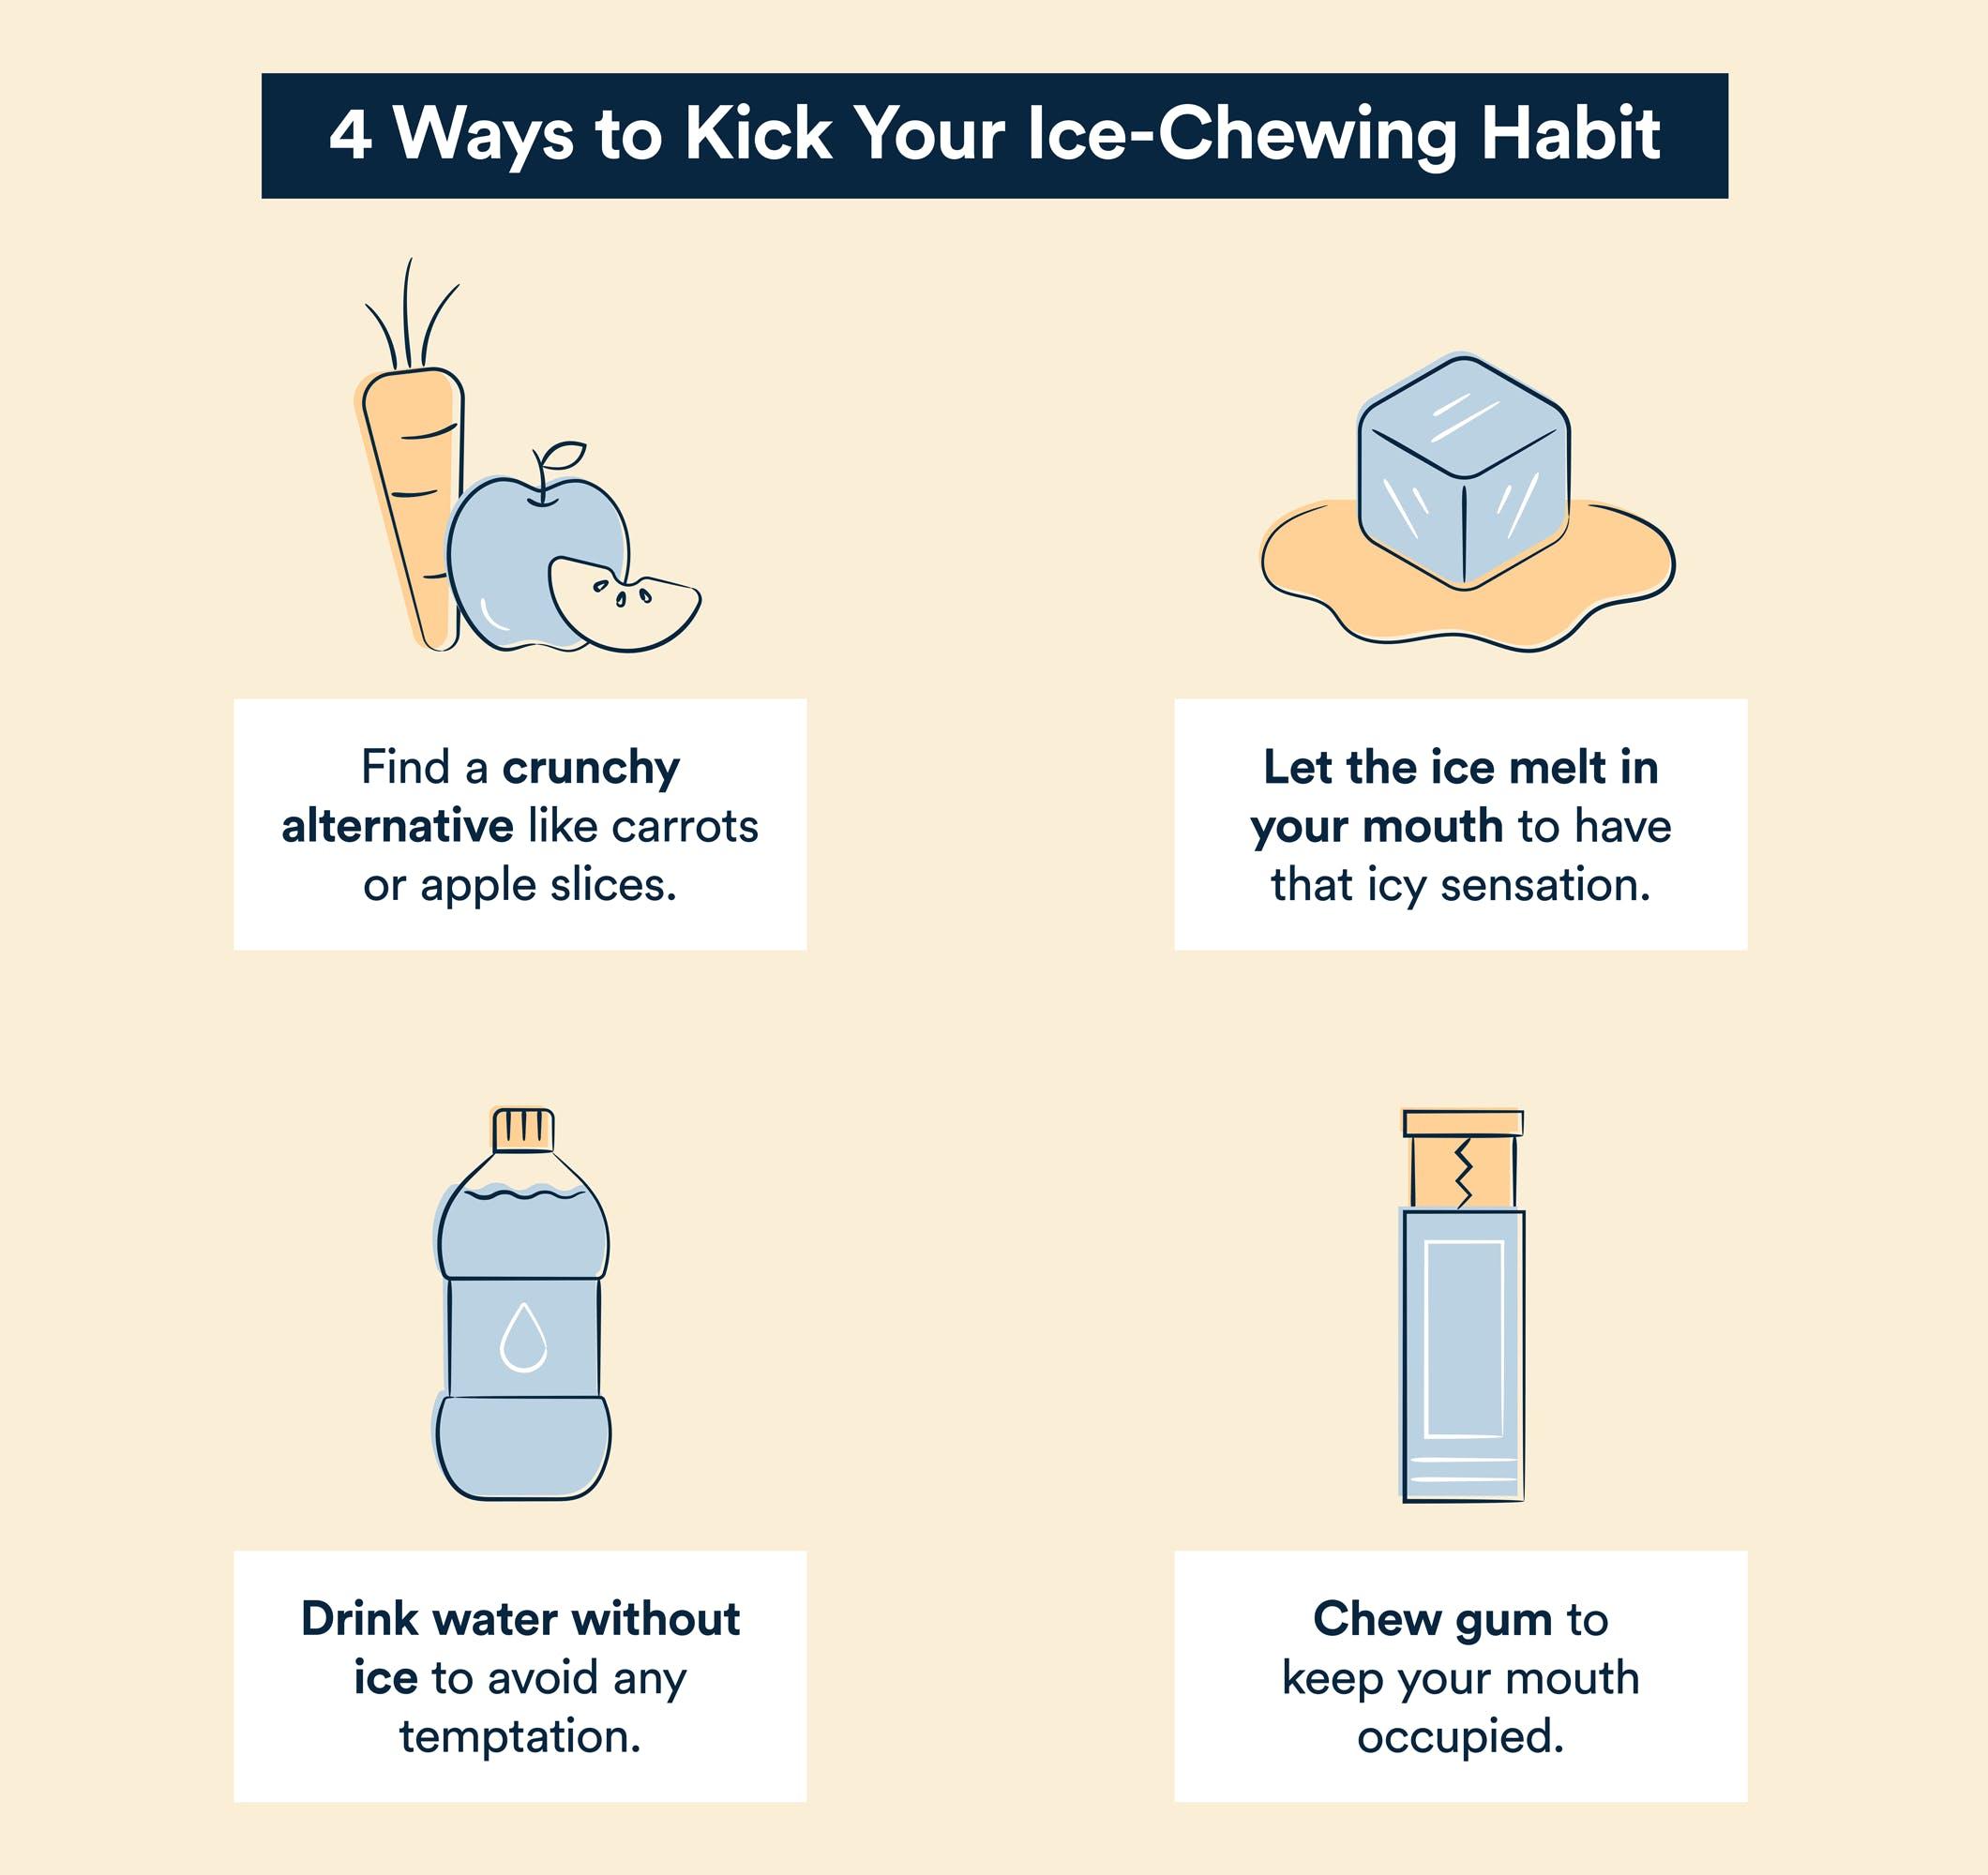 4 ways to kick ice chewing habit